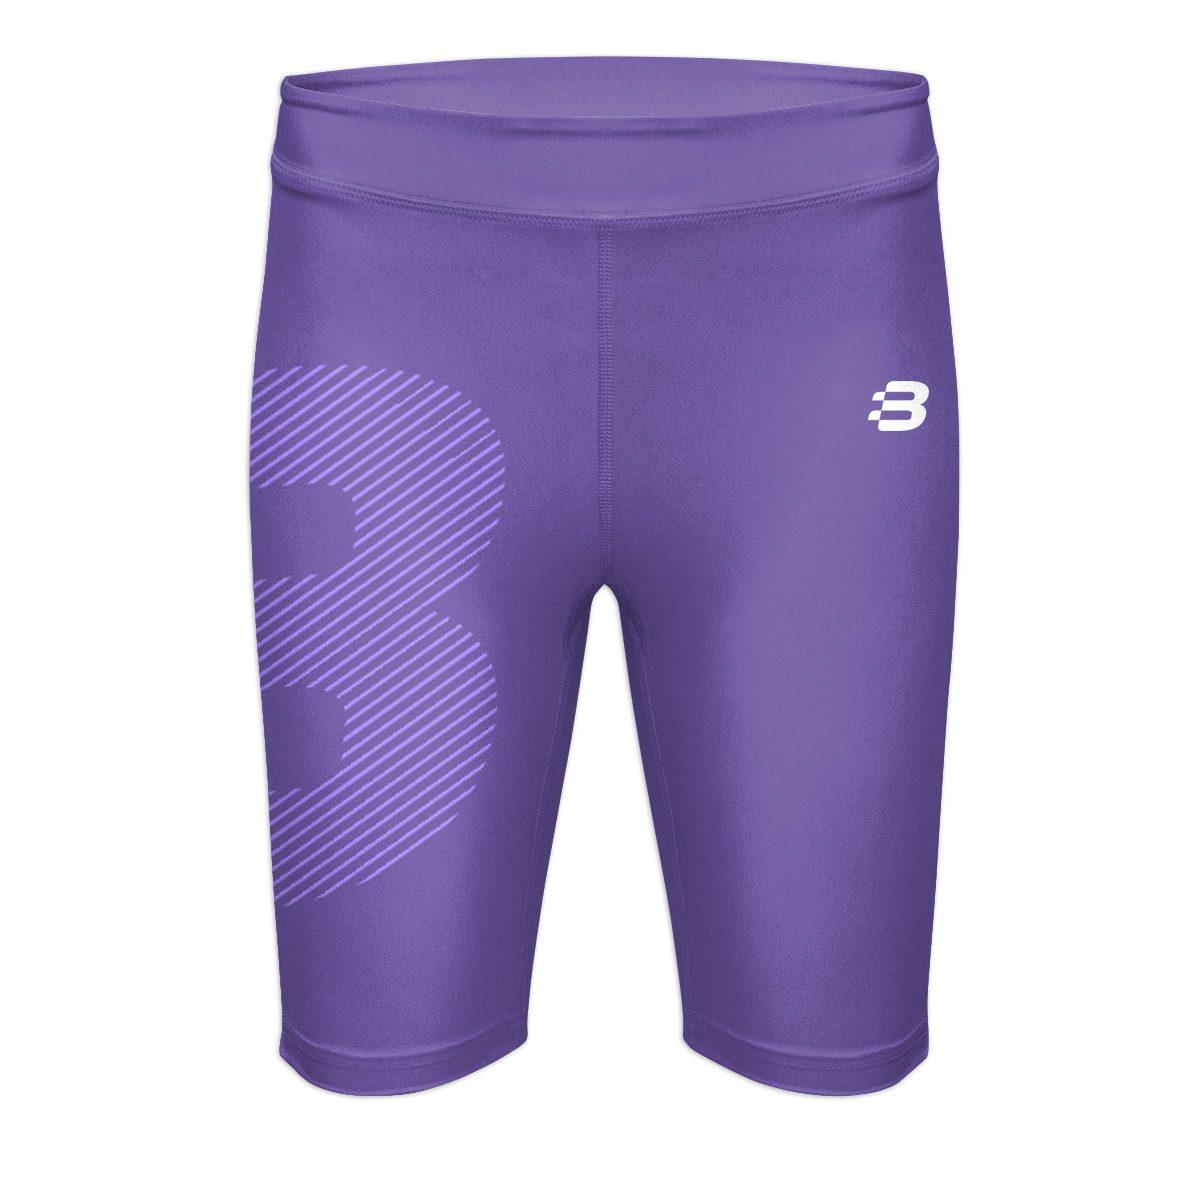 Ladies Compression Shorts - Purple